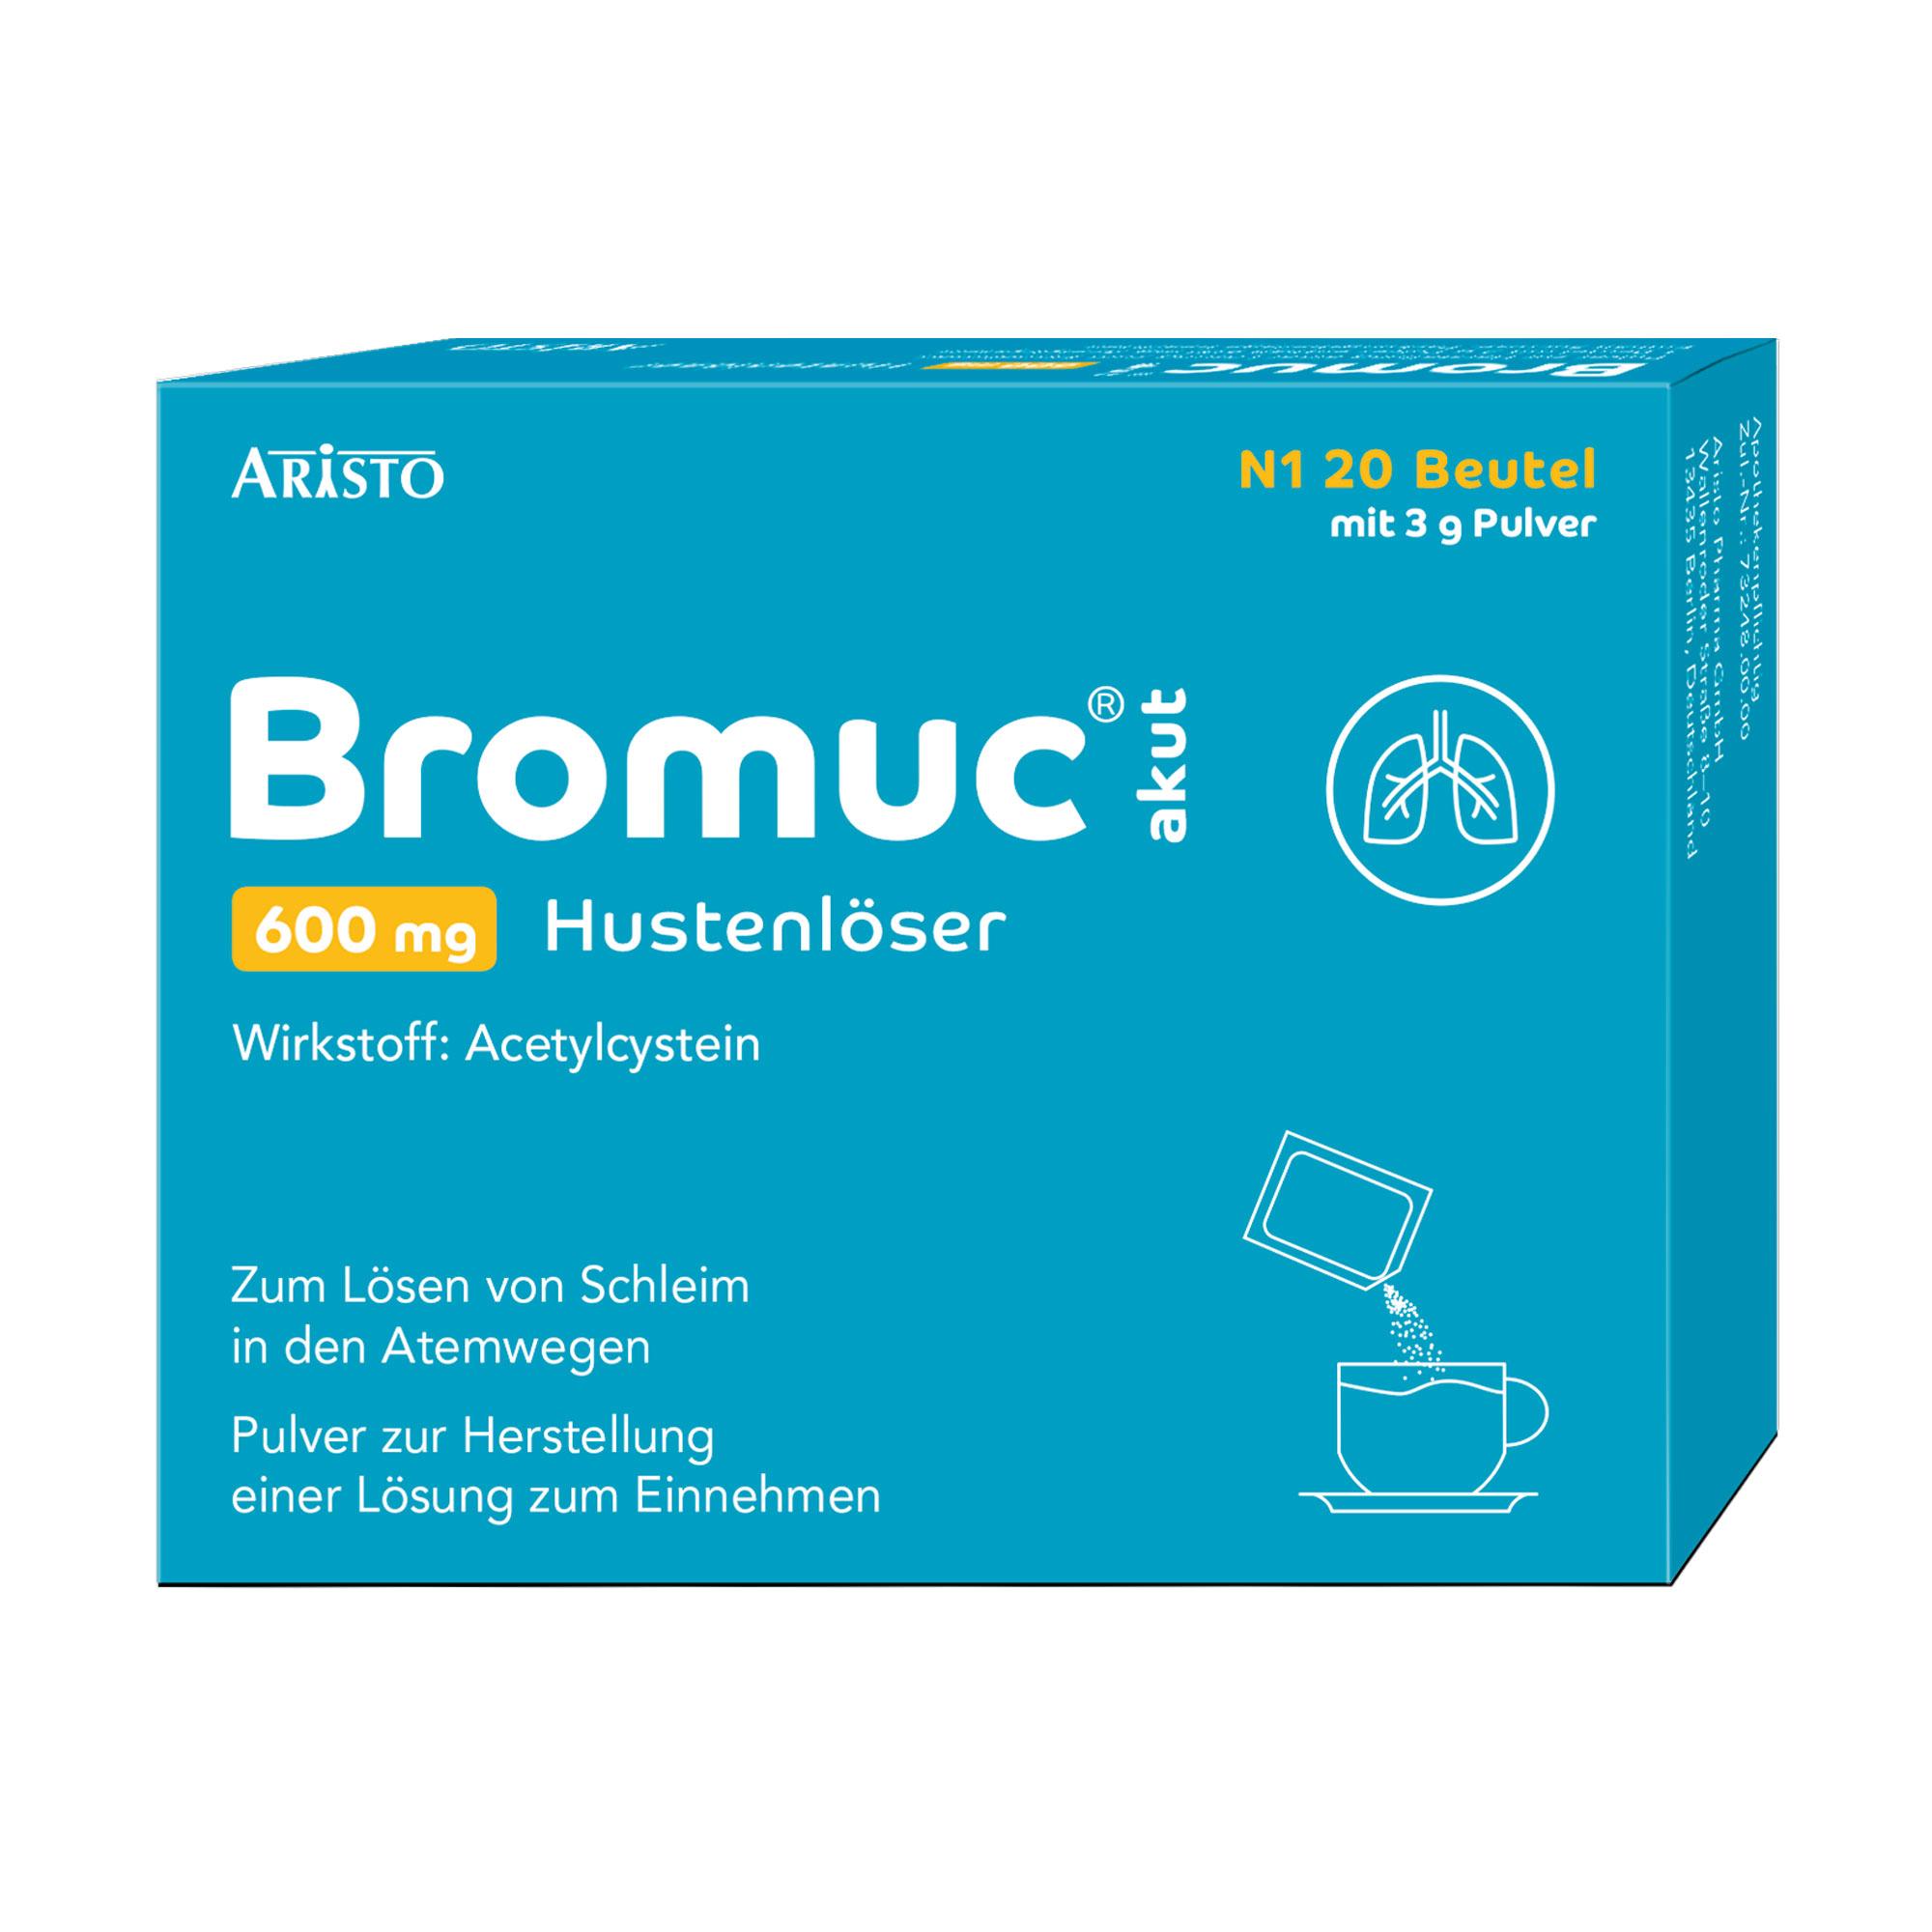 Bromuc akut 600 mg Hustenlöser